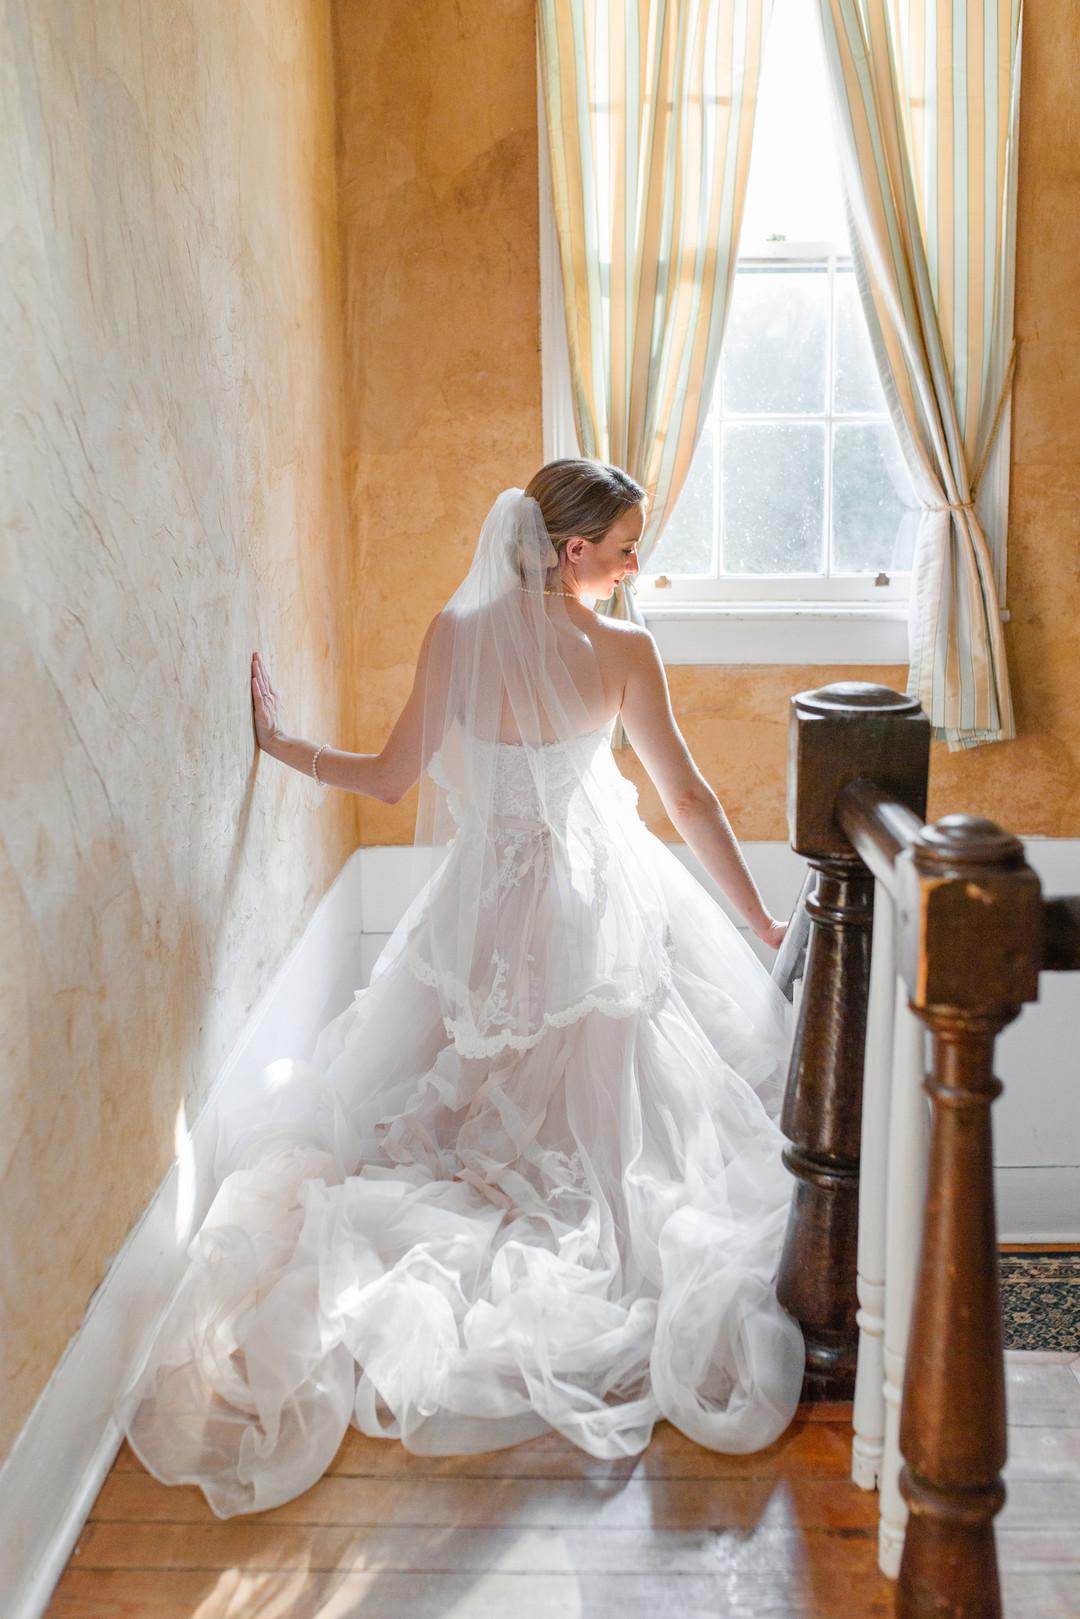 old-wide-awake-plantation-wedding-5.JPG